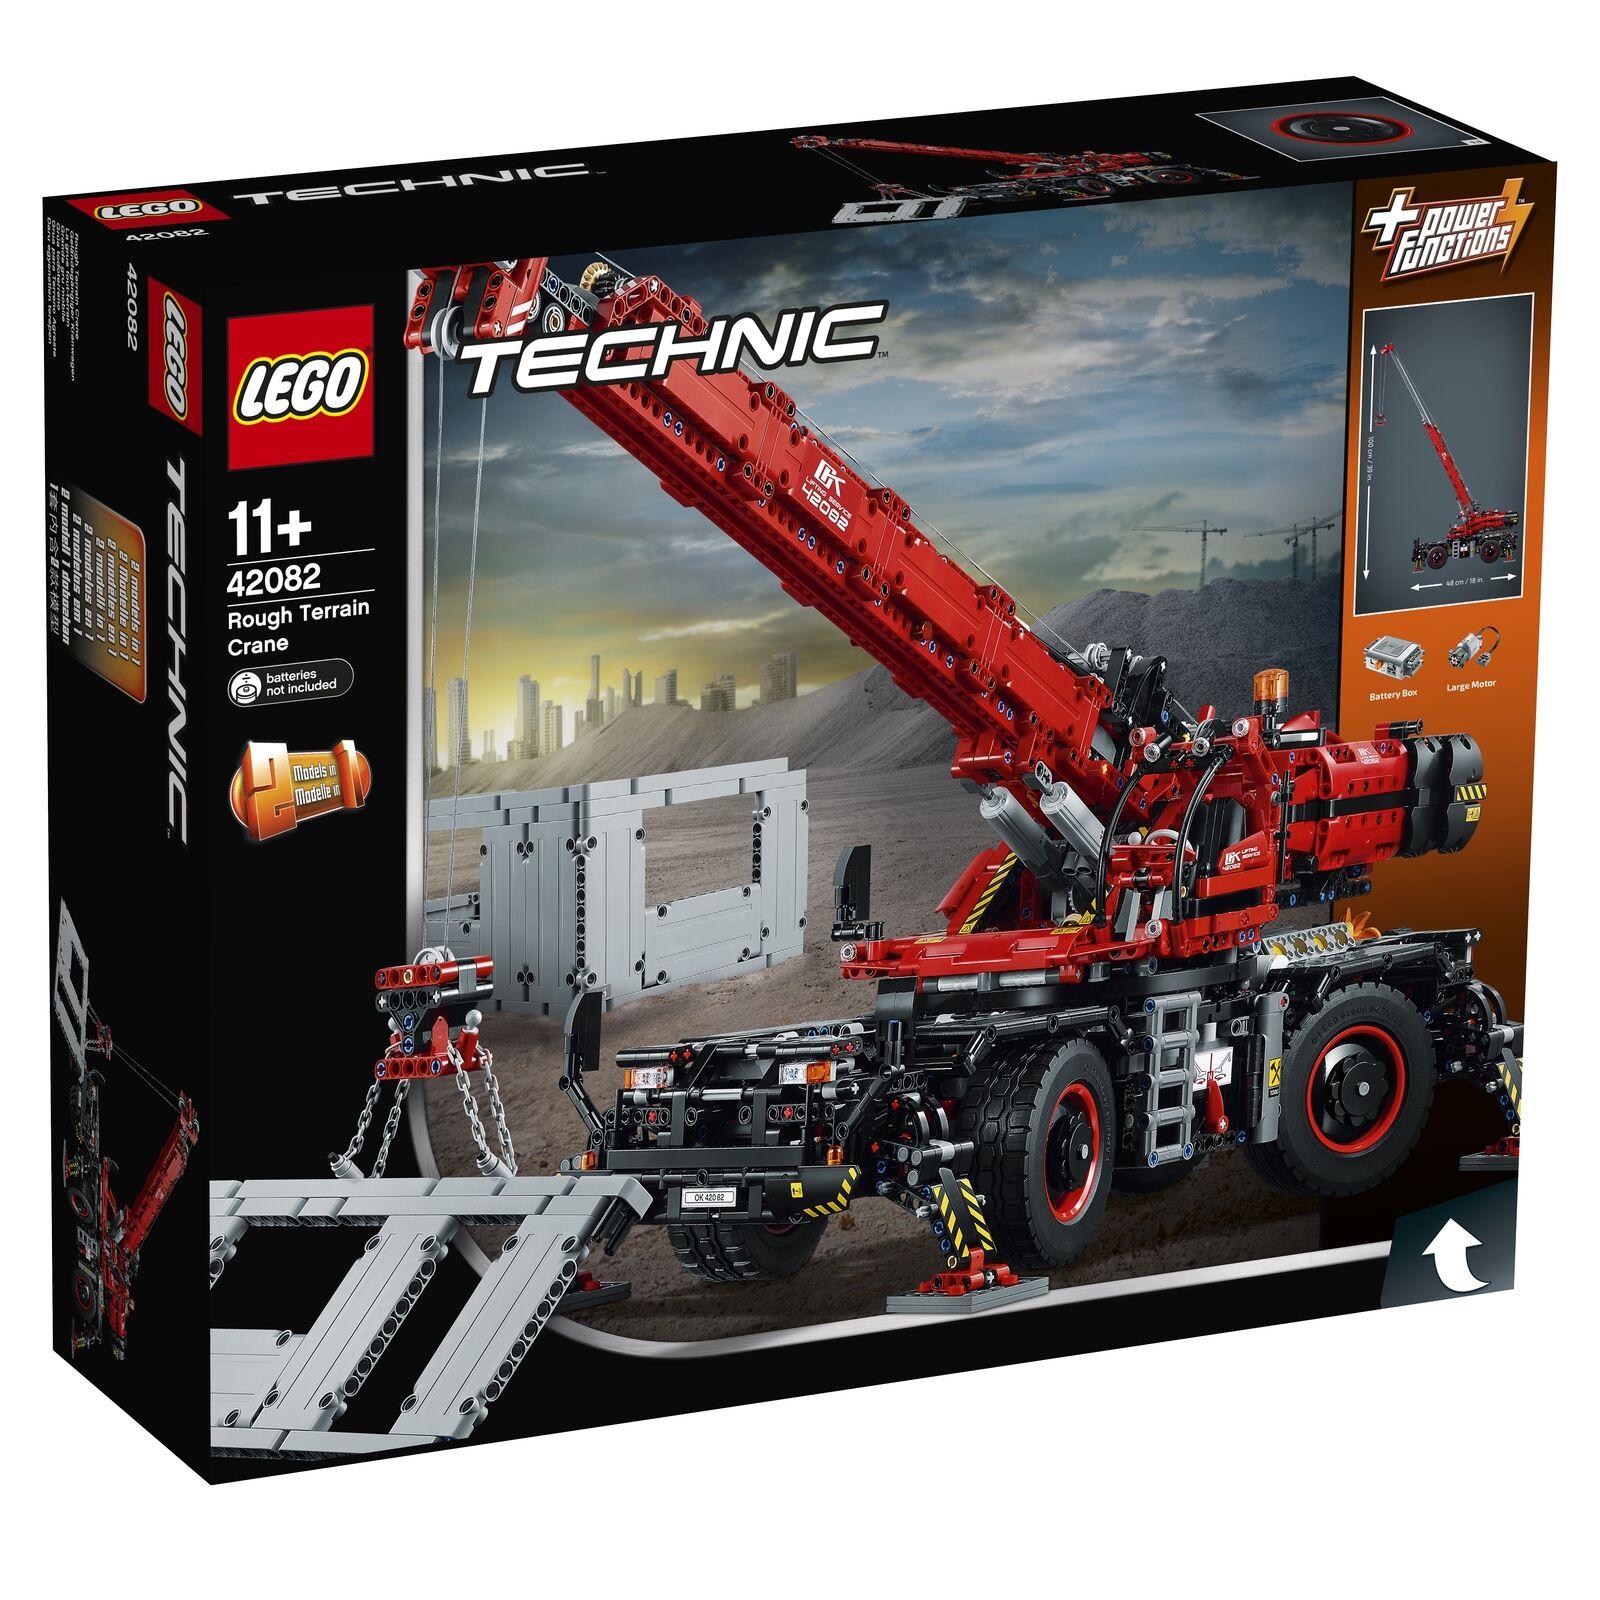 Boxed New Lego Technic Rough Terrain Crane (42082) Authentic Fast Delivery